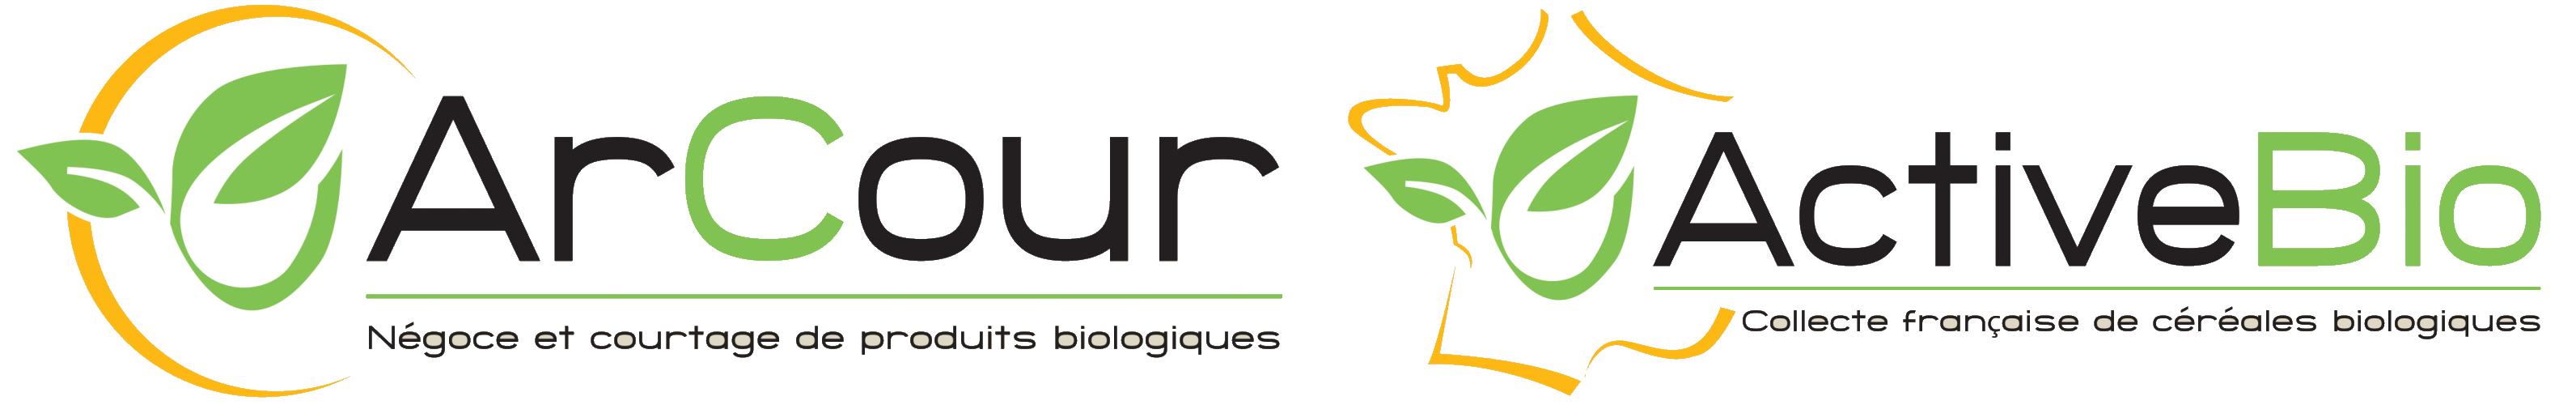 Arcour - Active Bio